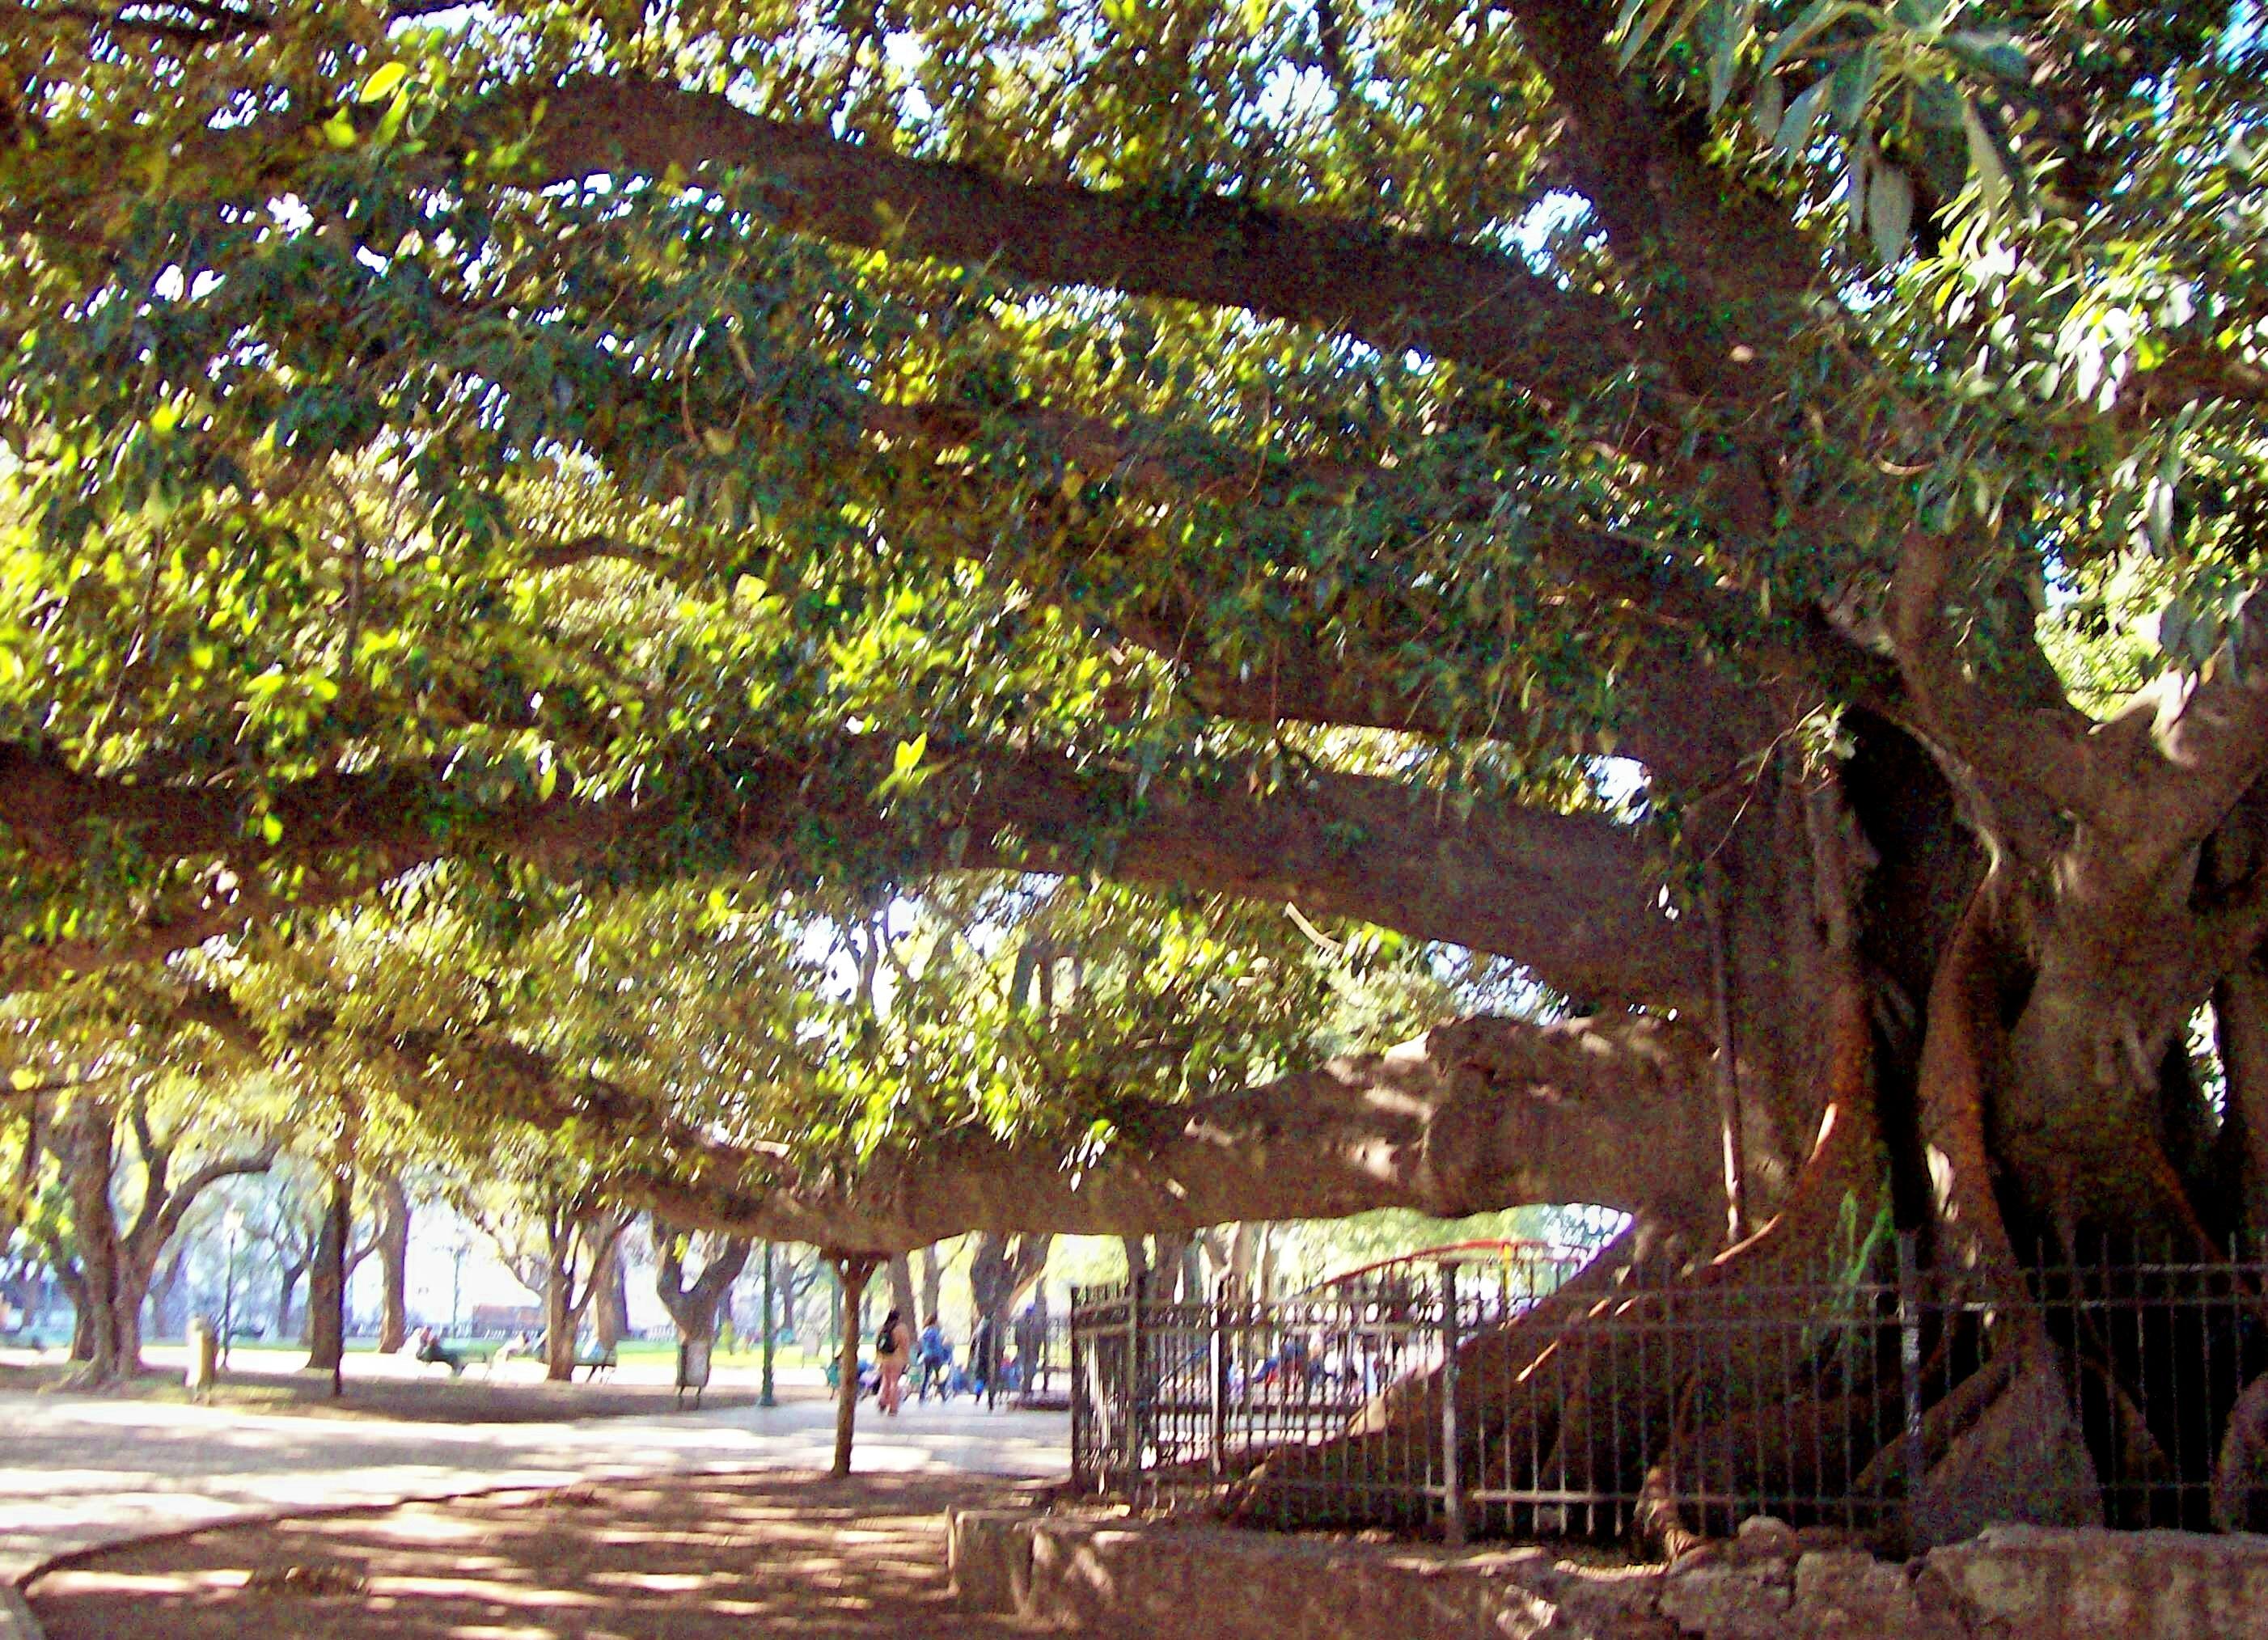 File:Gomero Ficus Elastica, Plaza San Martín.jpg